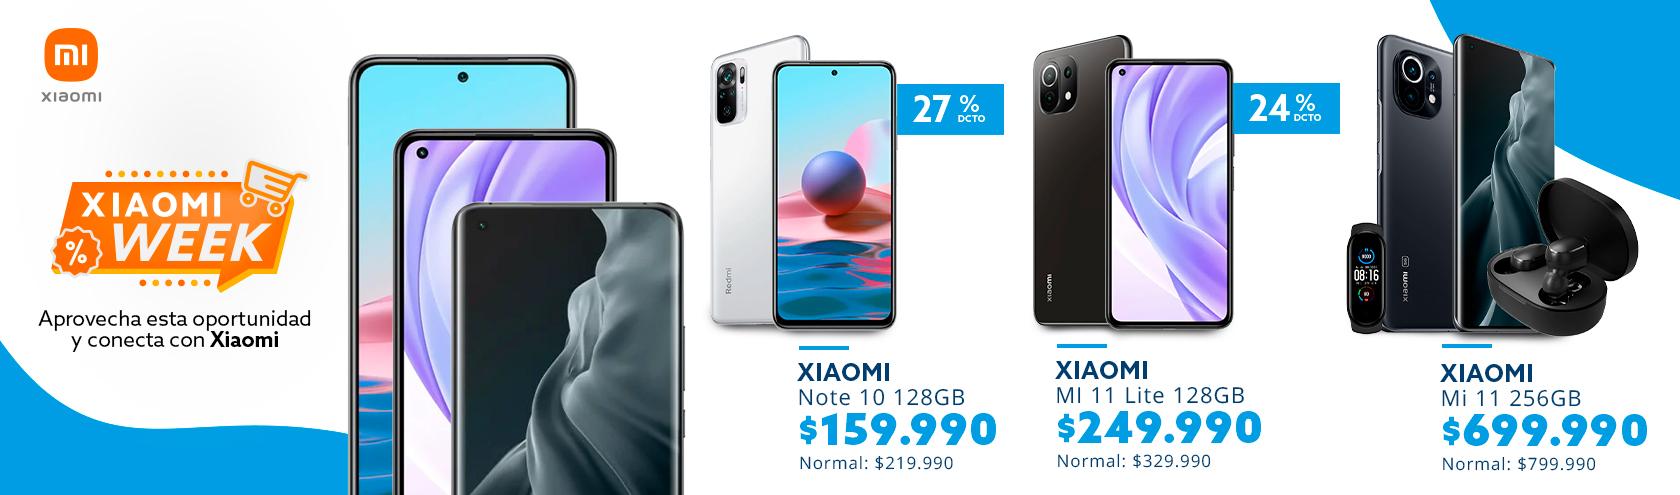 Xiaomi week